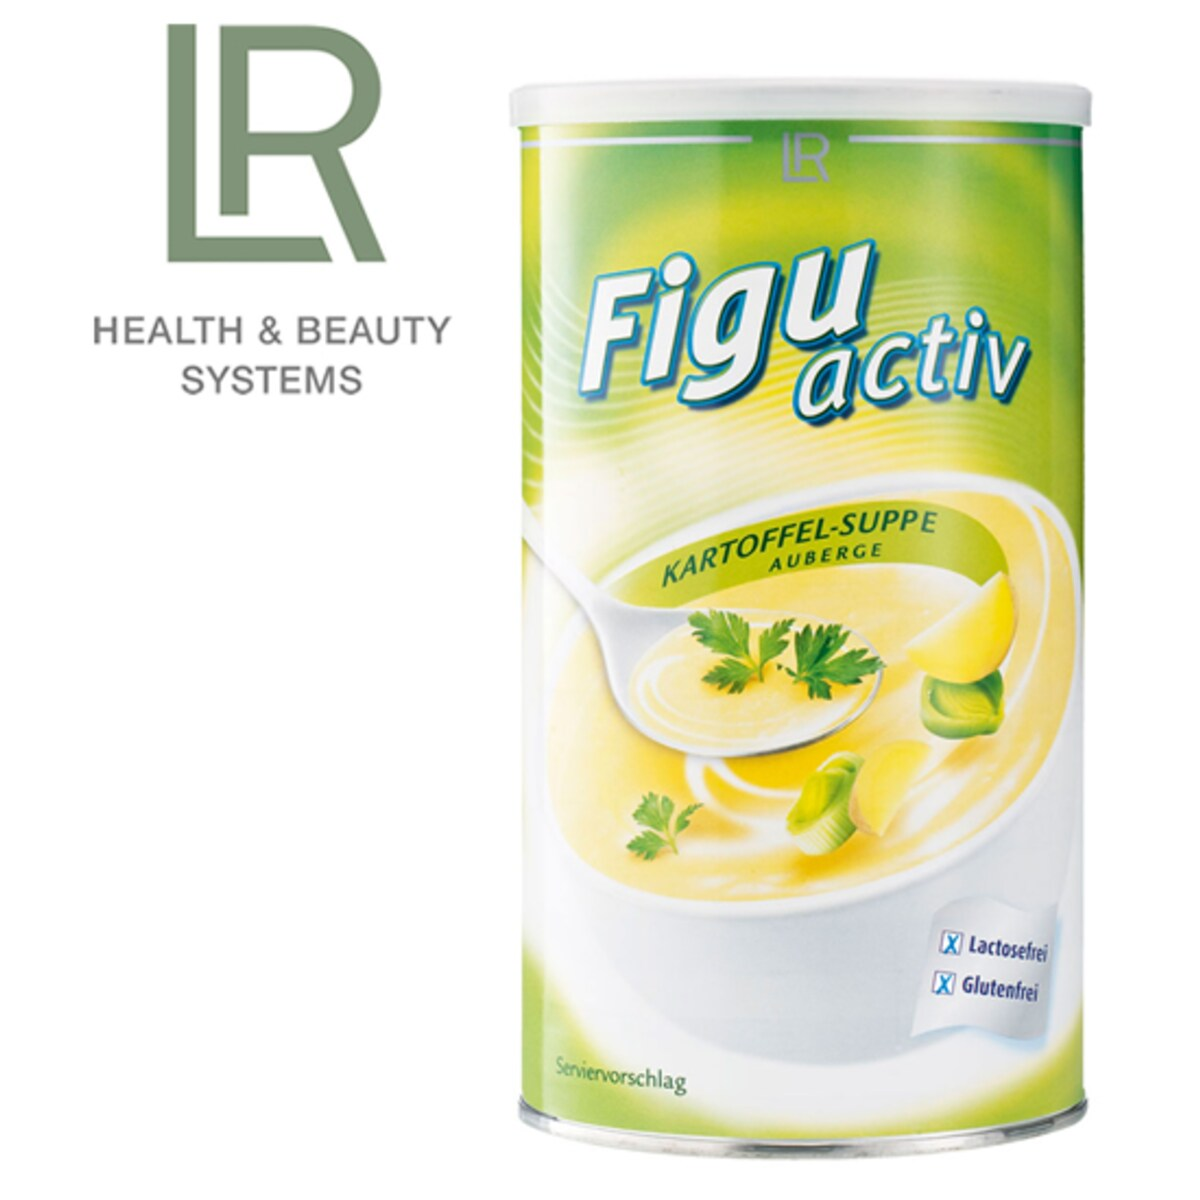 LR FiguActiv картофена супа в кутия 500гр